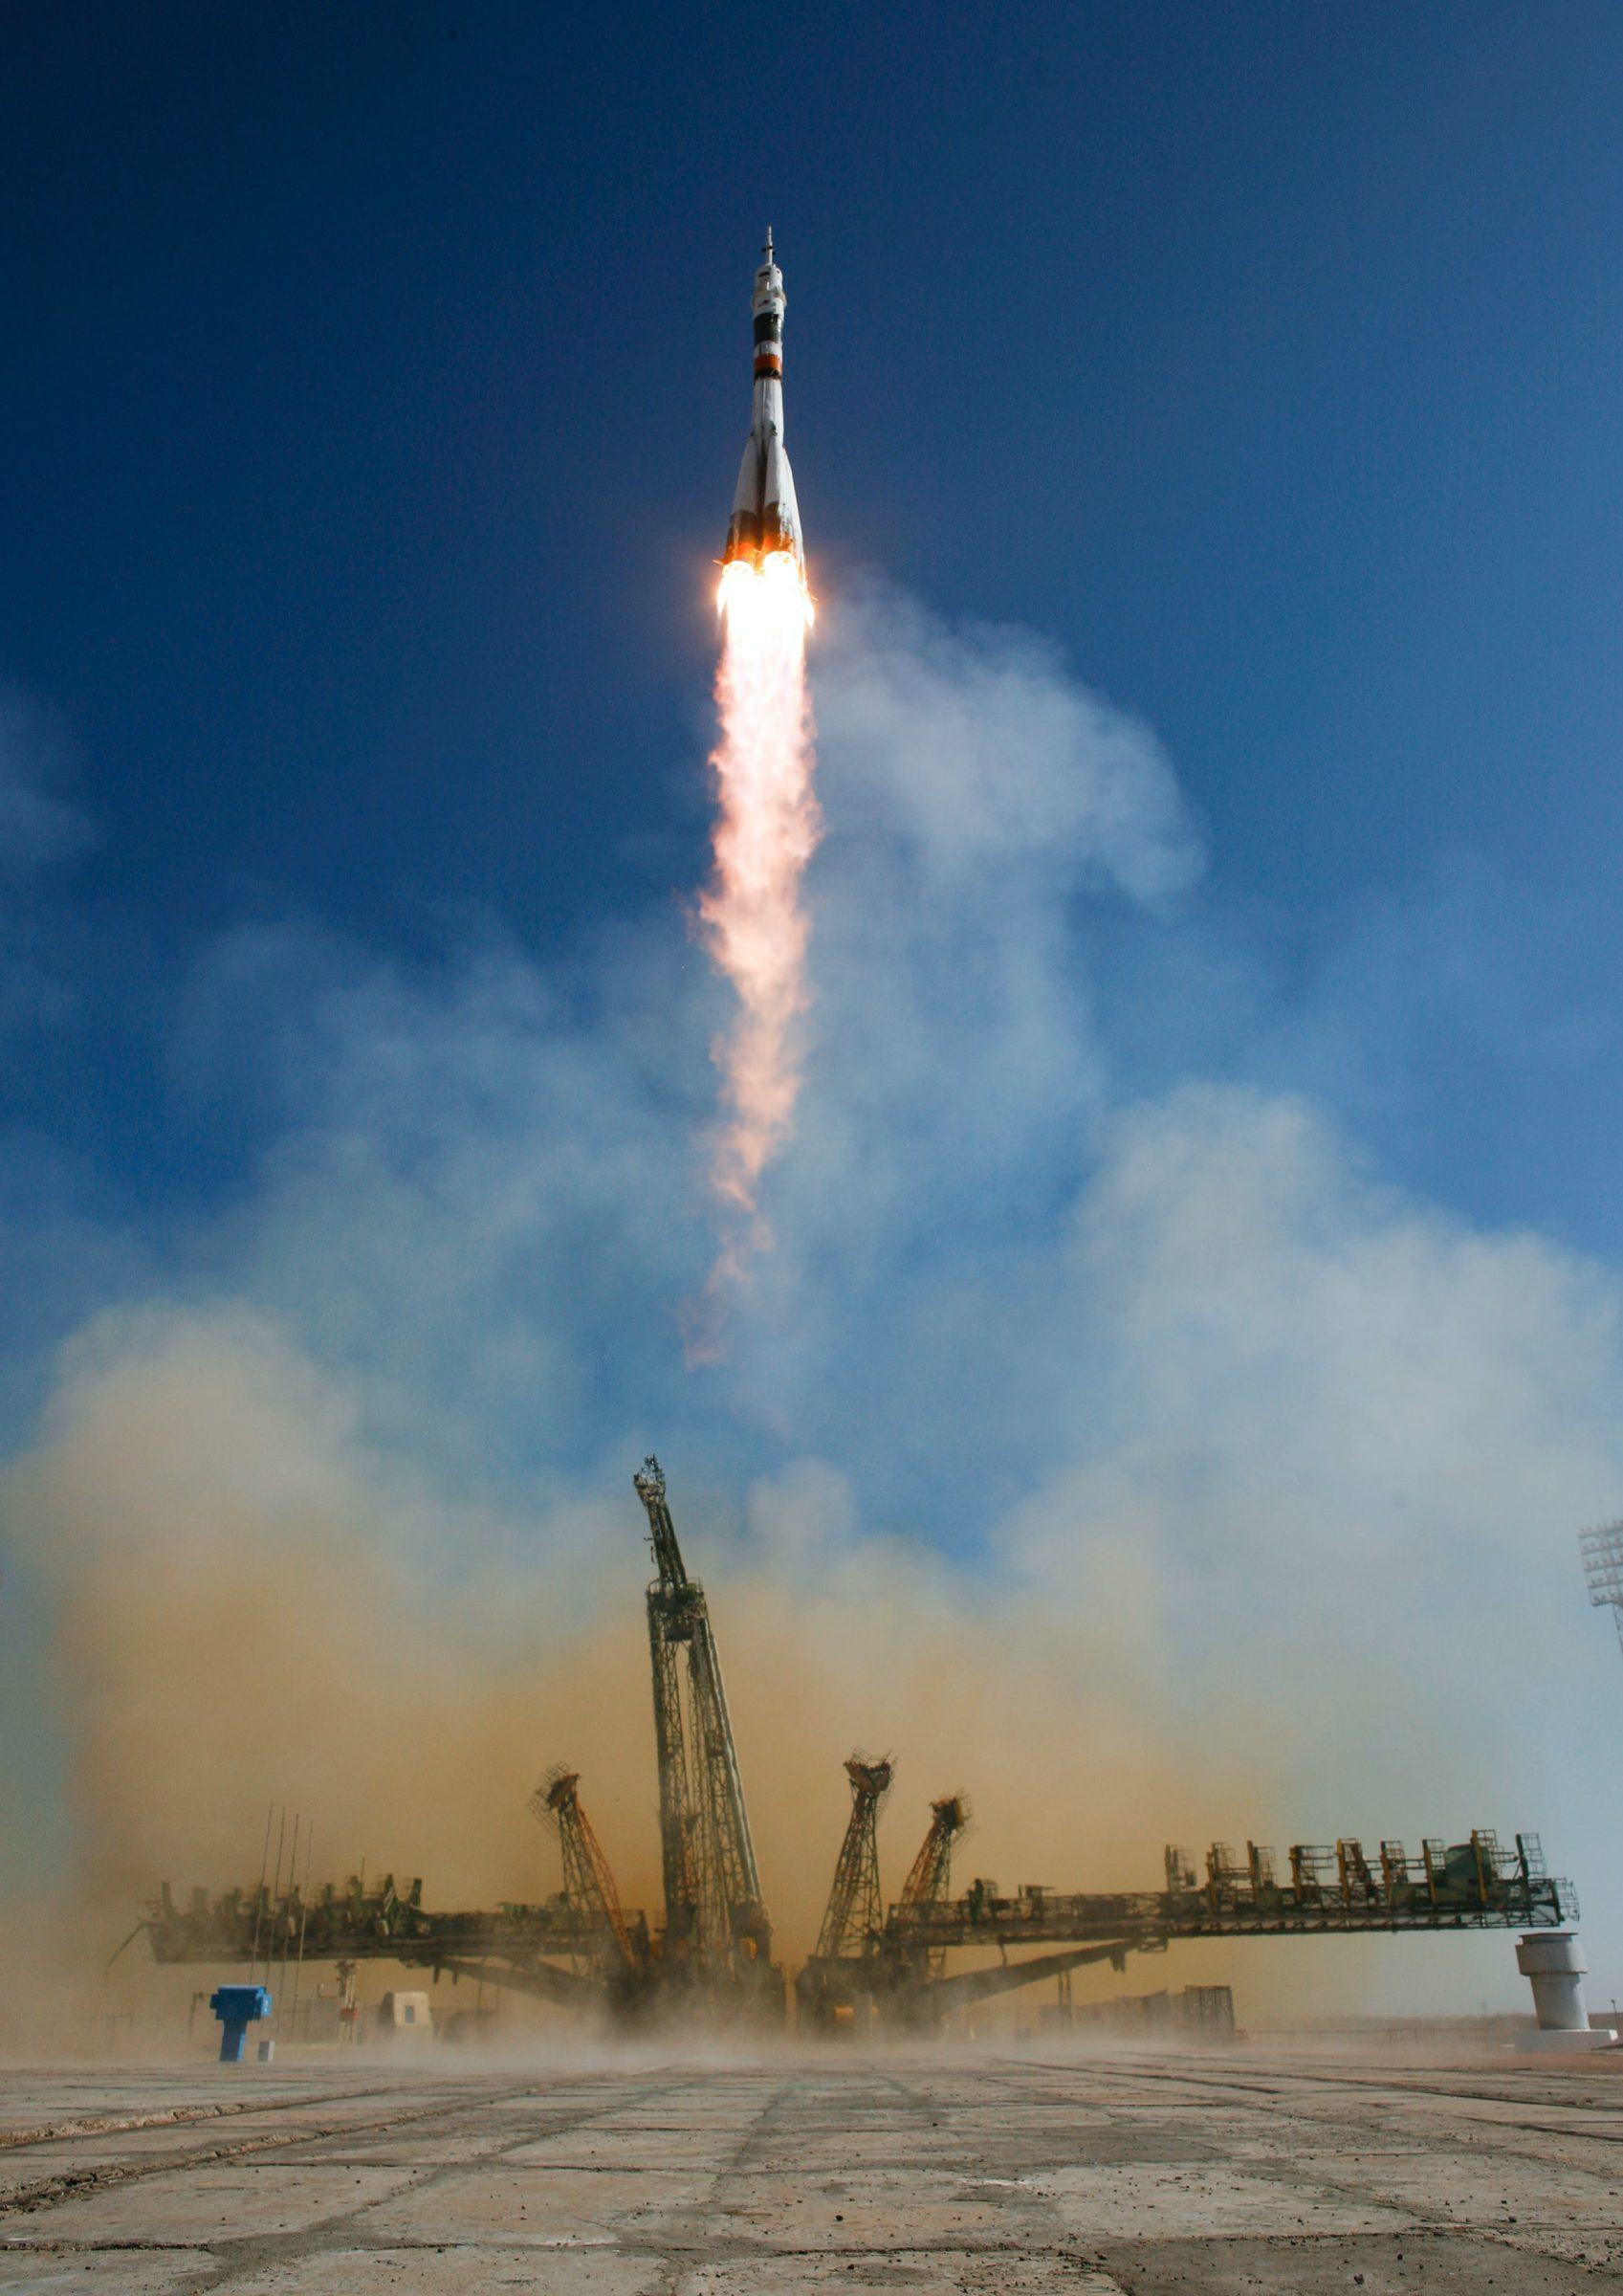 Soyuz TMA-16 lanceert vanaf Baikonur